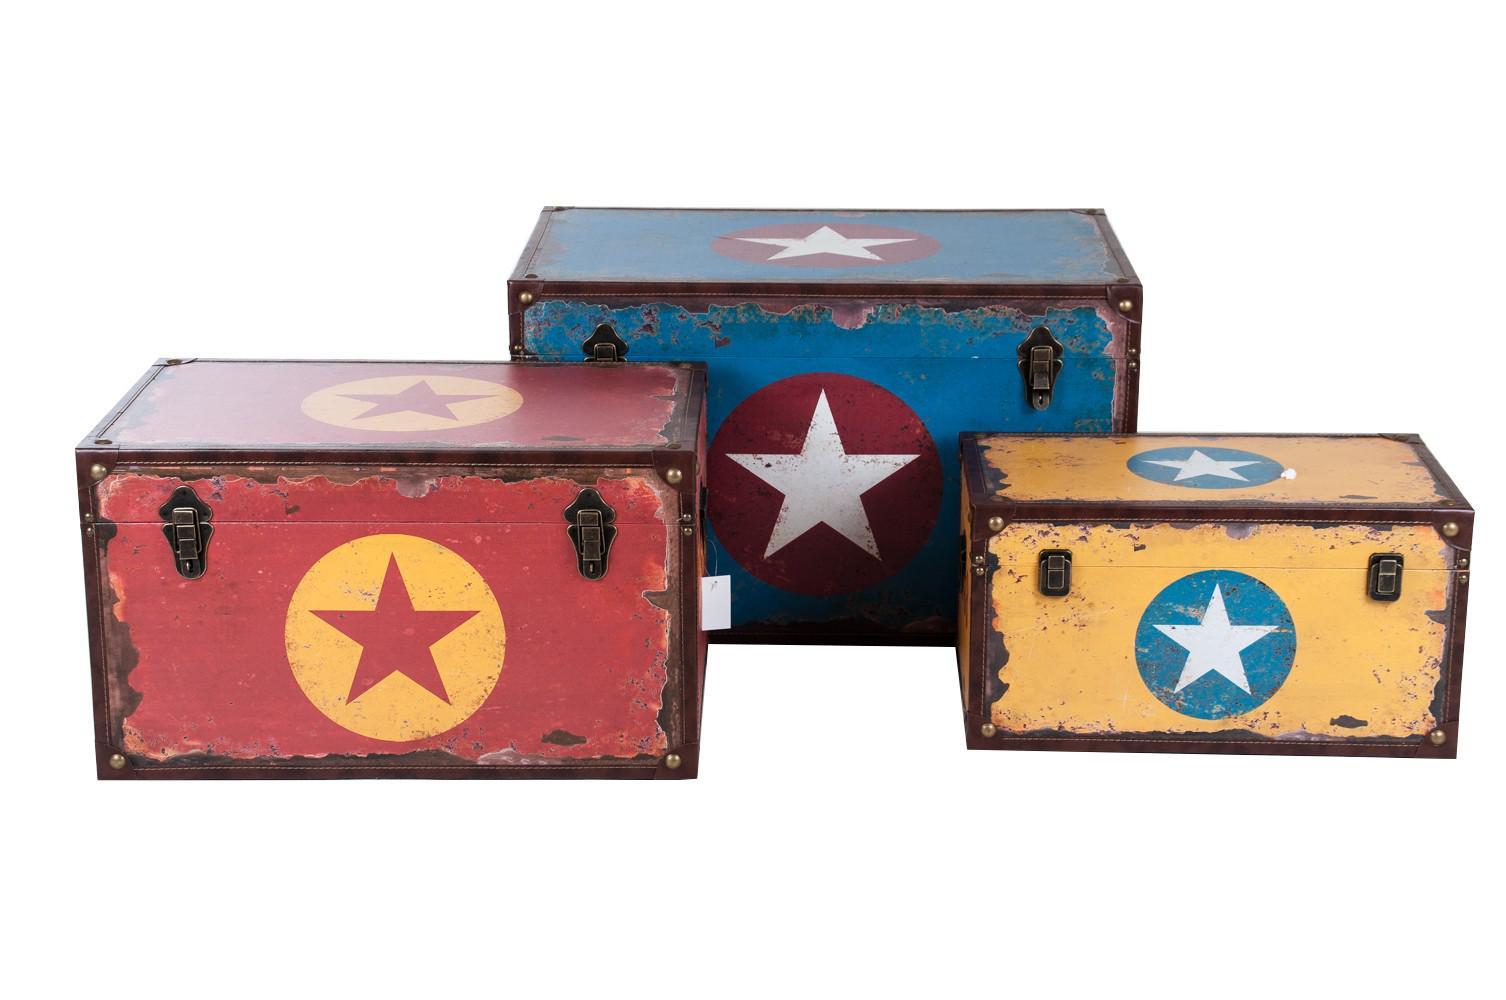 holztruhe sterndesign vintage holzkiste holztruhe truhe kiste aufbewahrungsbox kaufen bei www. Black Bedroom Furniture Sets. Home Design Ideas